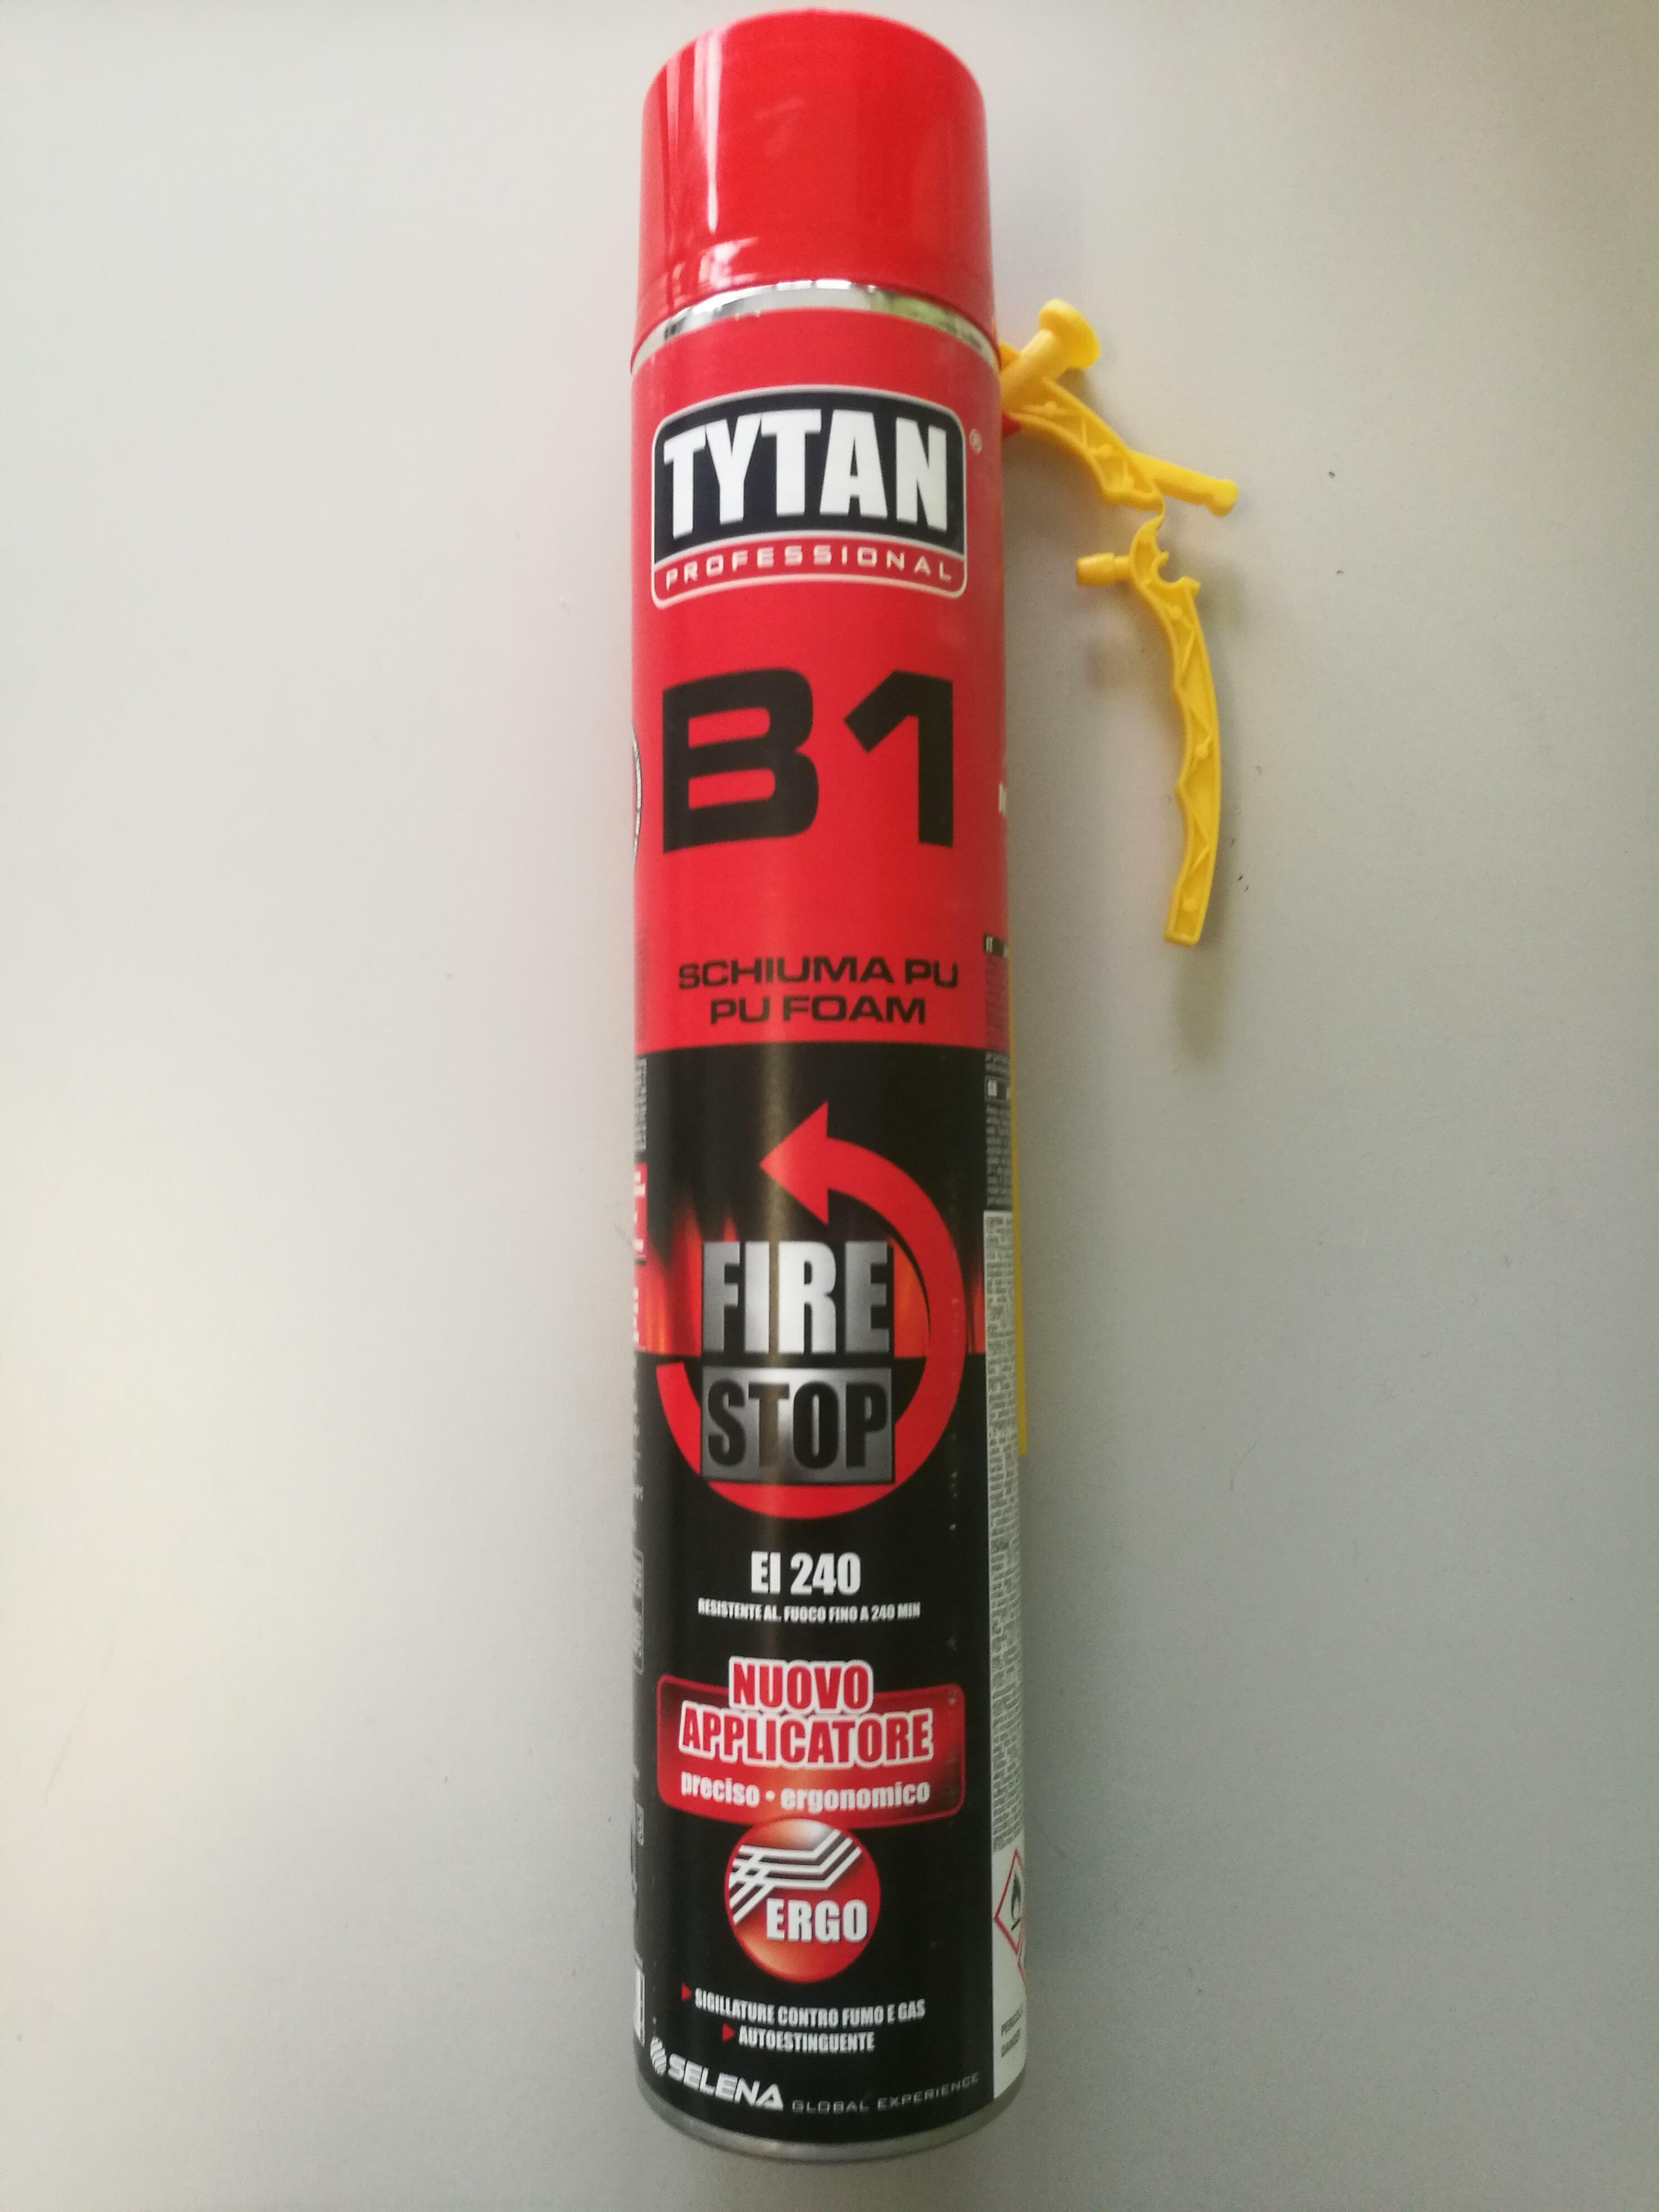 tytan professional tytan professional schiuma poliuretanica ei 240 manuale 750 ml autoestinguente